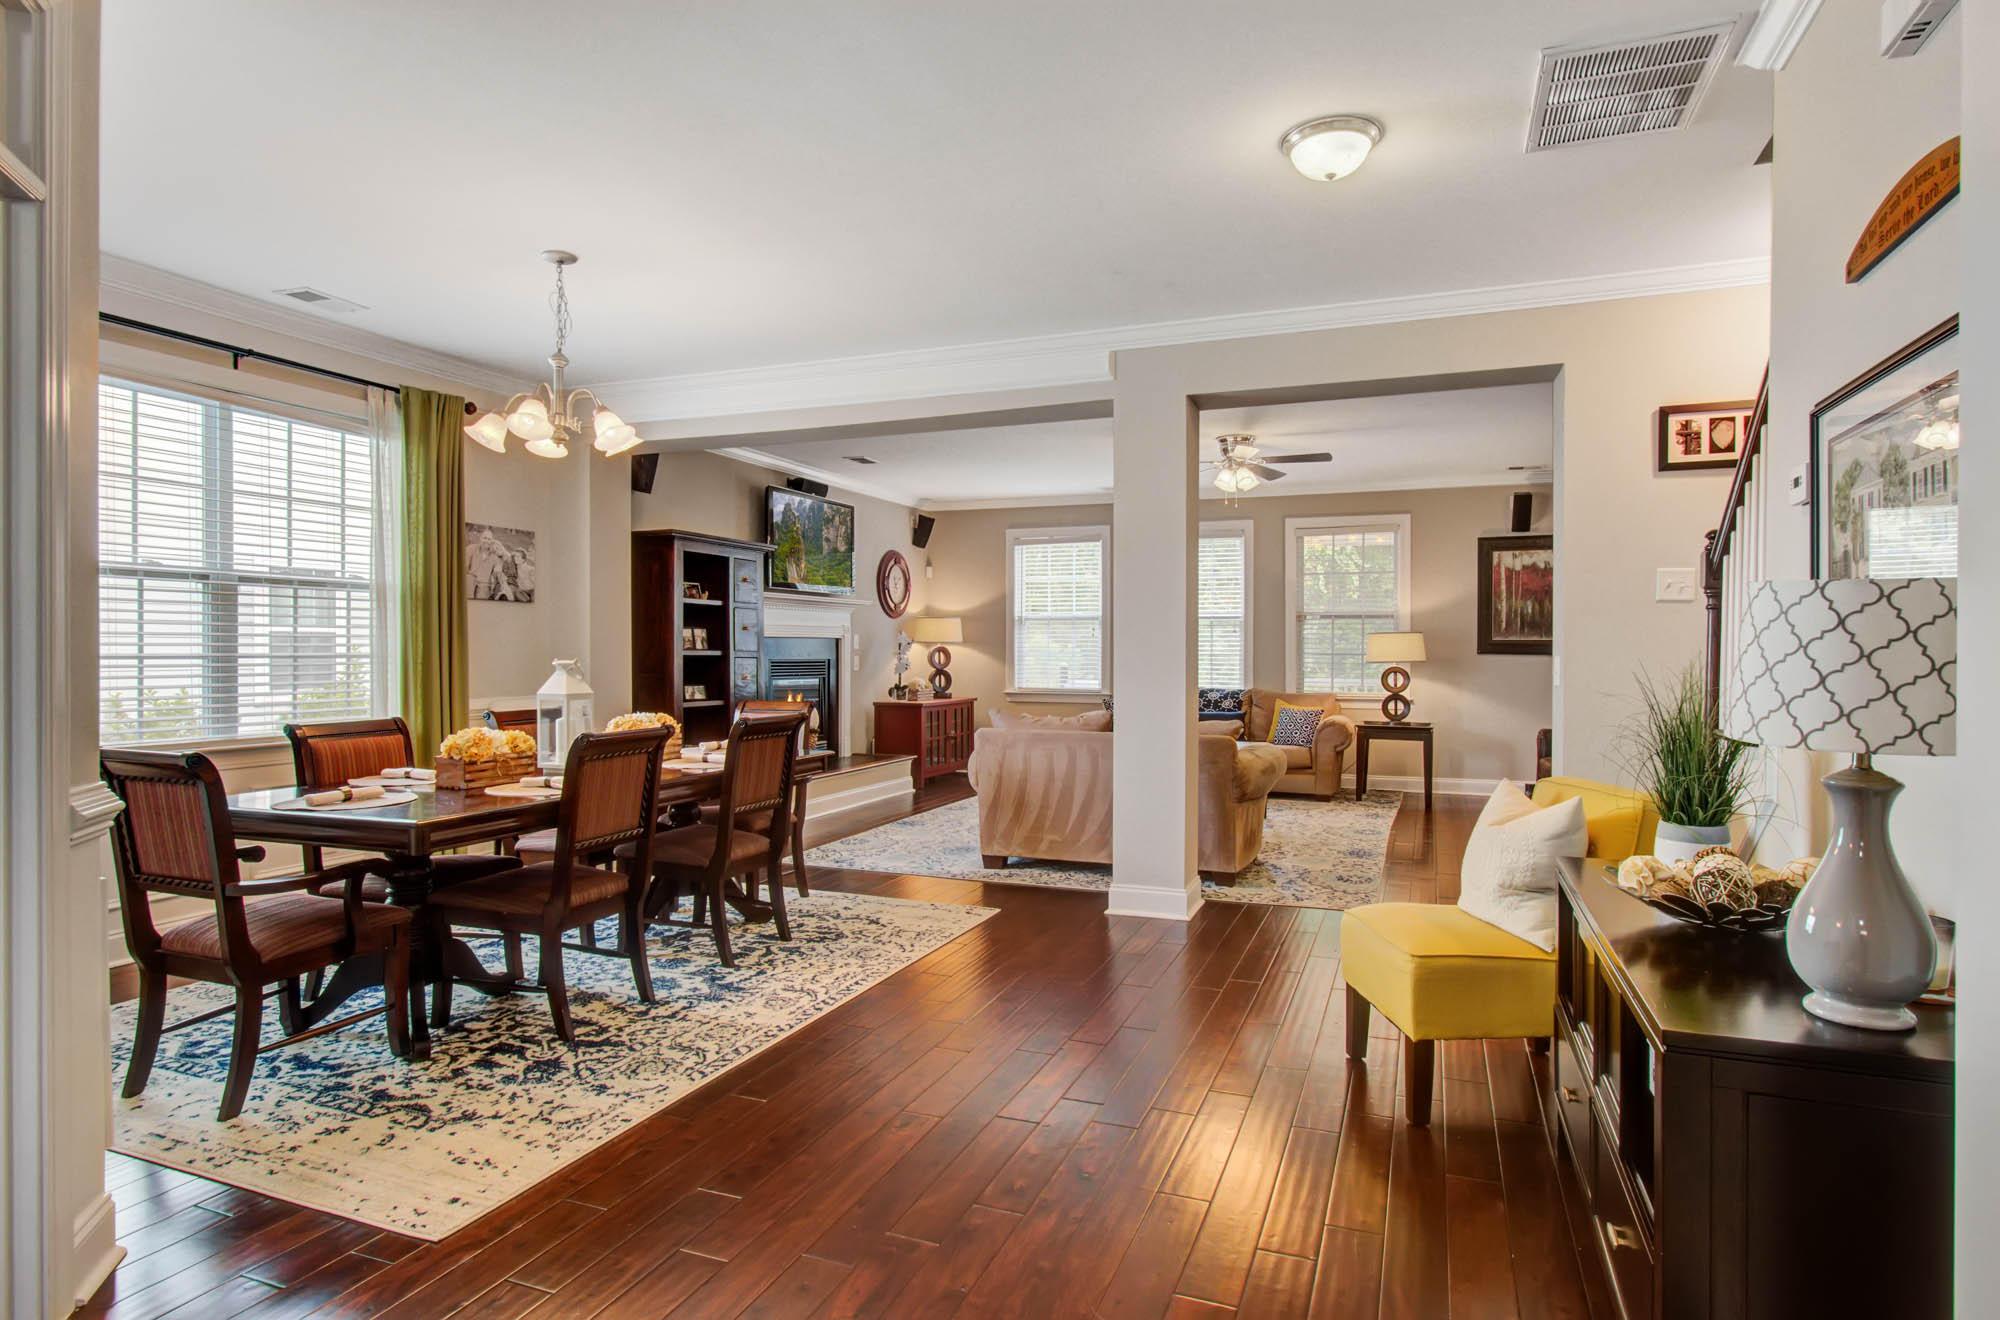 Indigo Palms Homes For Sale - 8535 Majestic, North Charleston, SC - 38